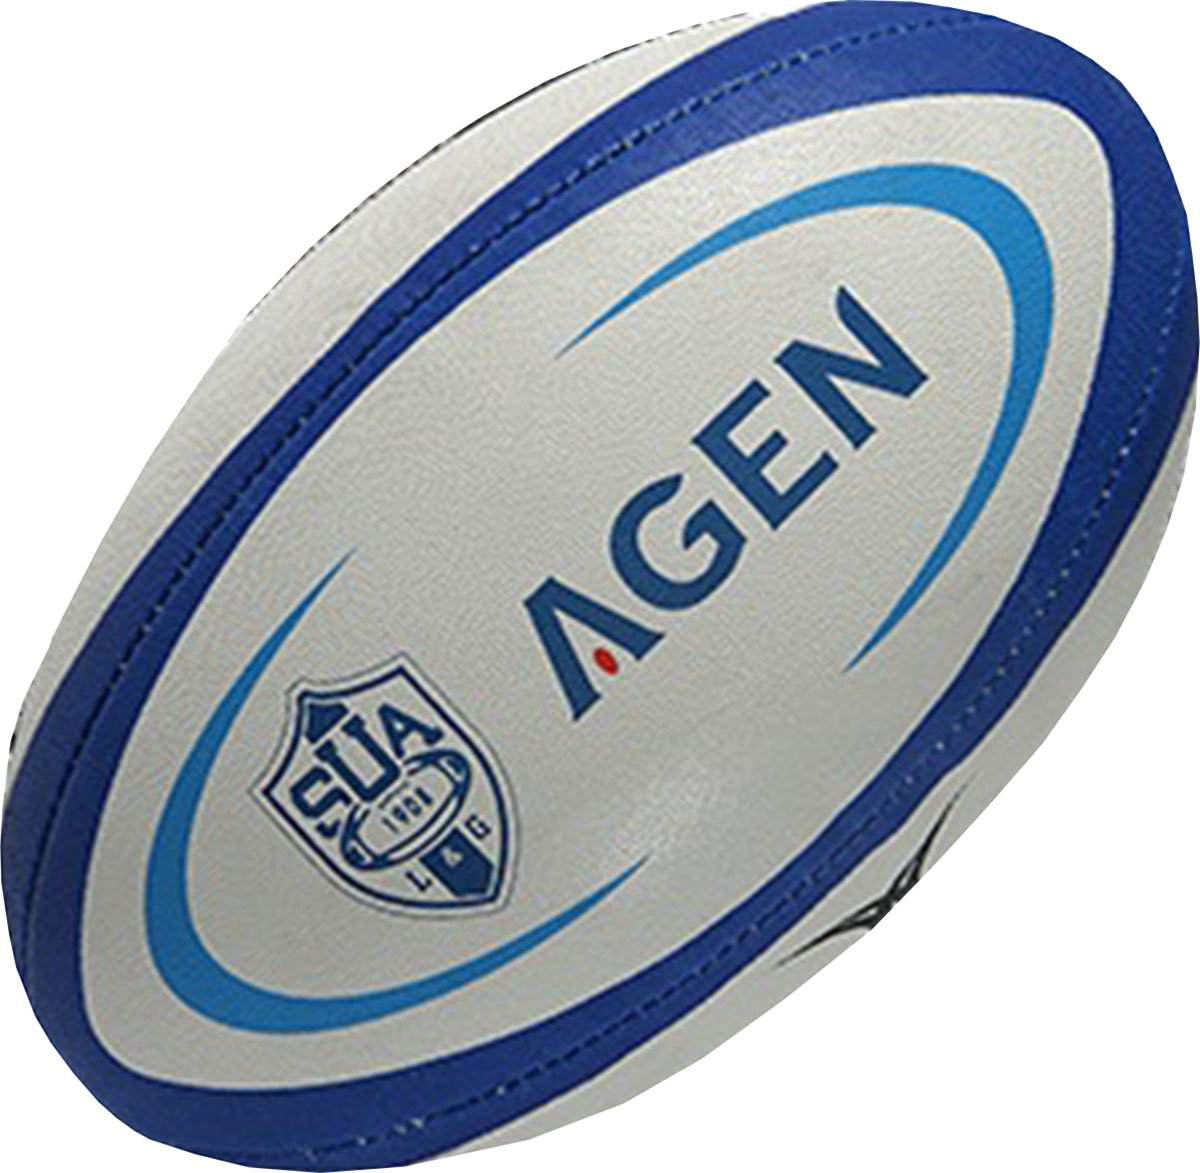 GILBERT rugby deporte Material de goma compuesto superficie ...